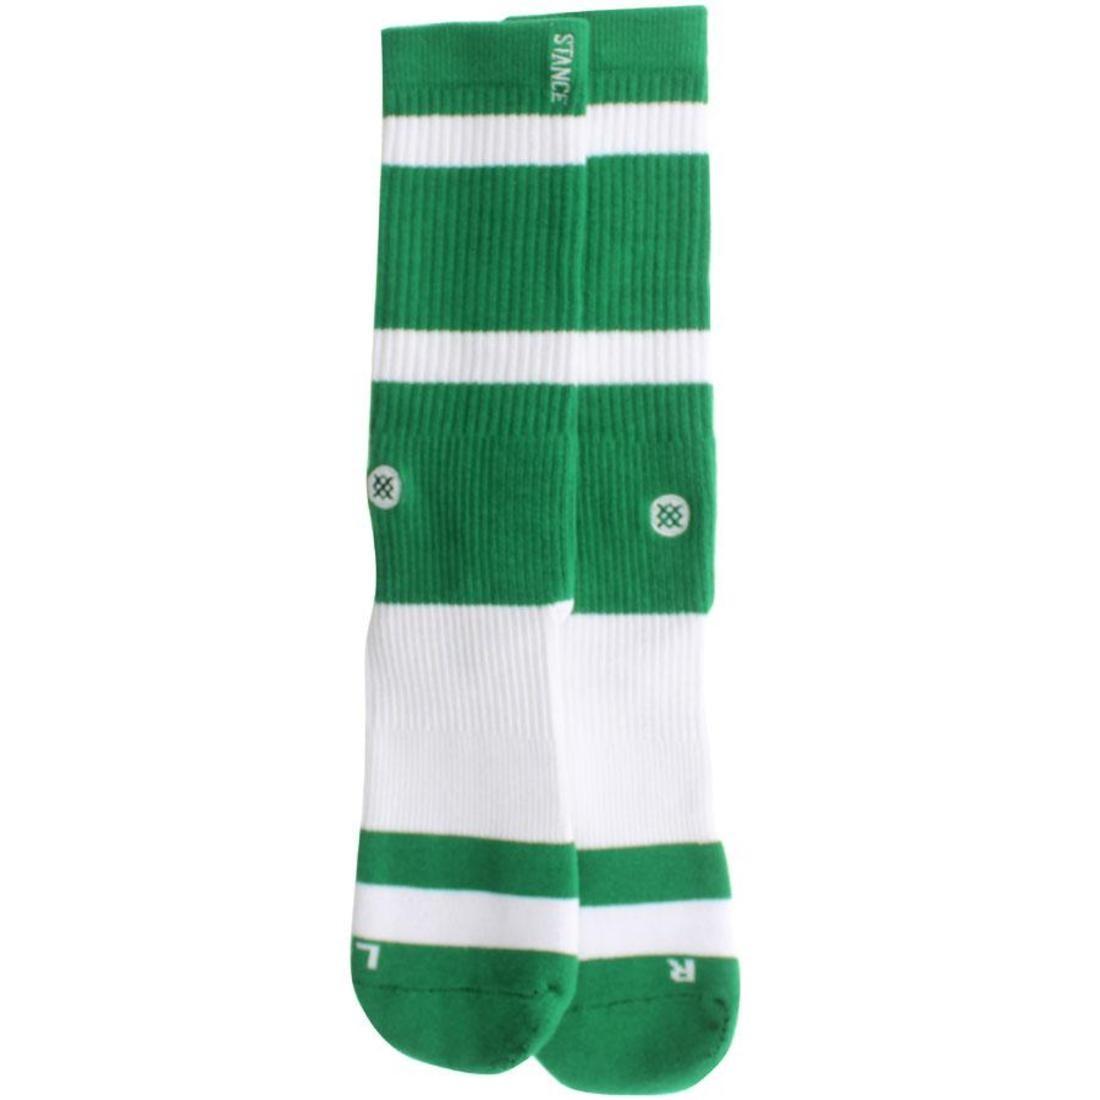 Stance Boston Socks (green)